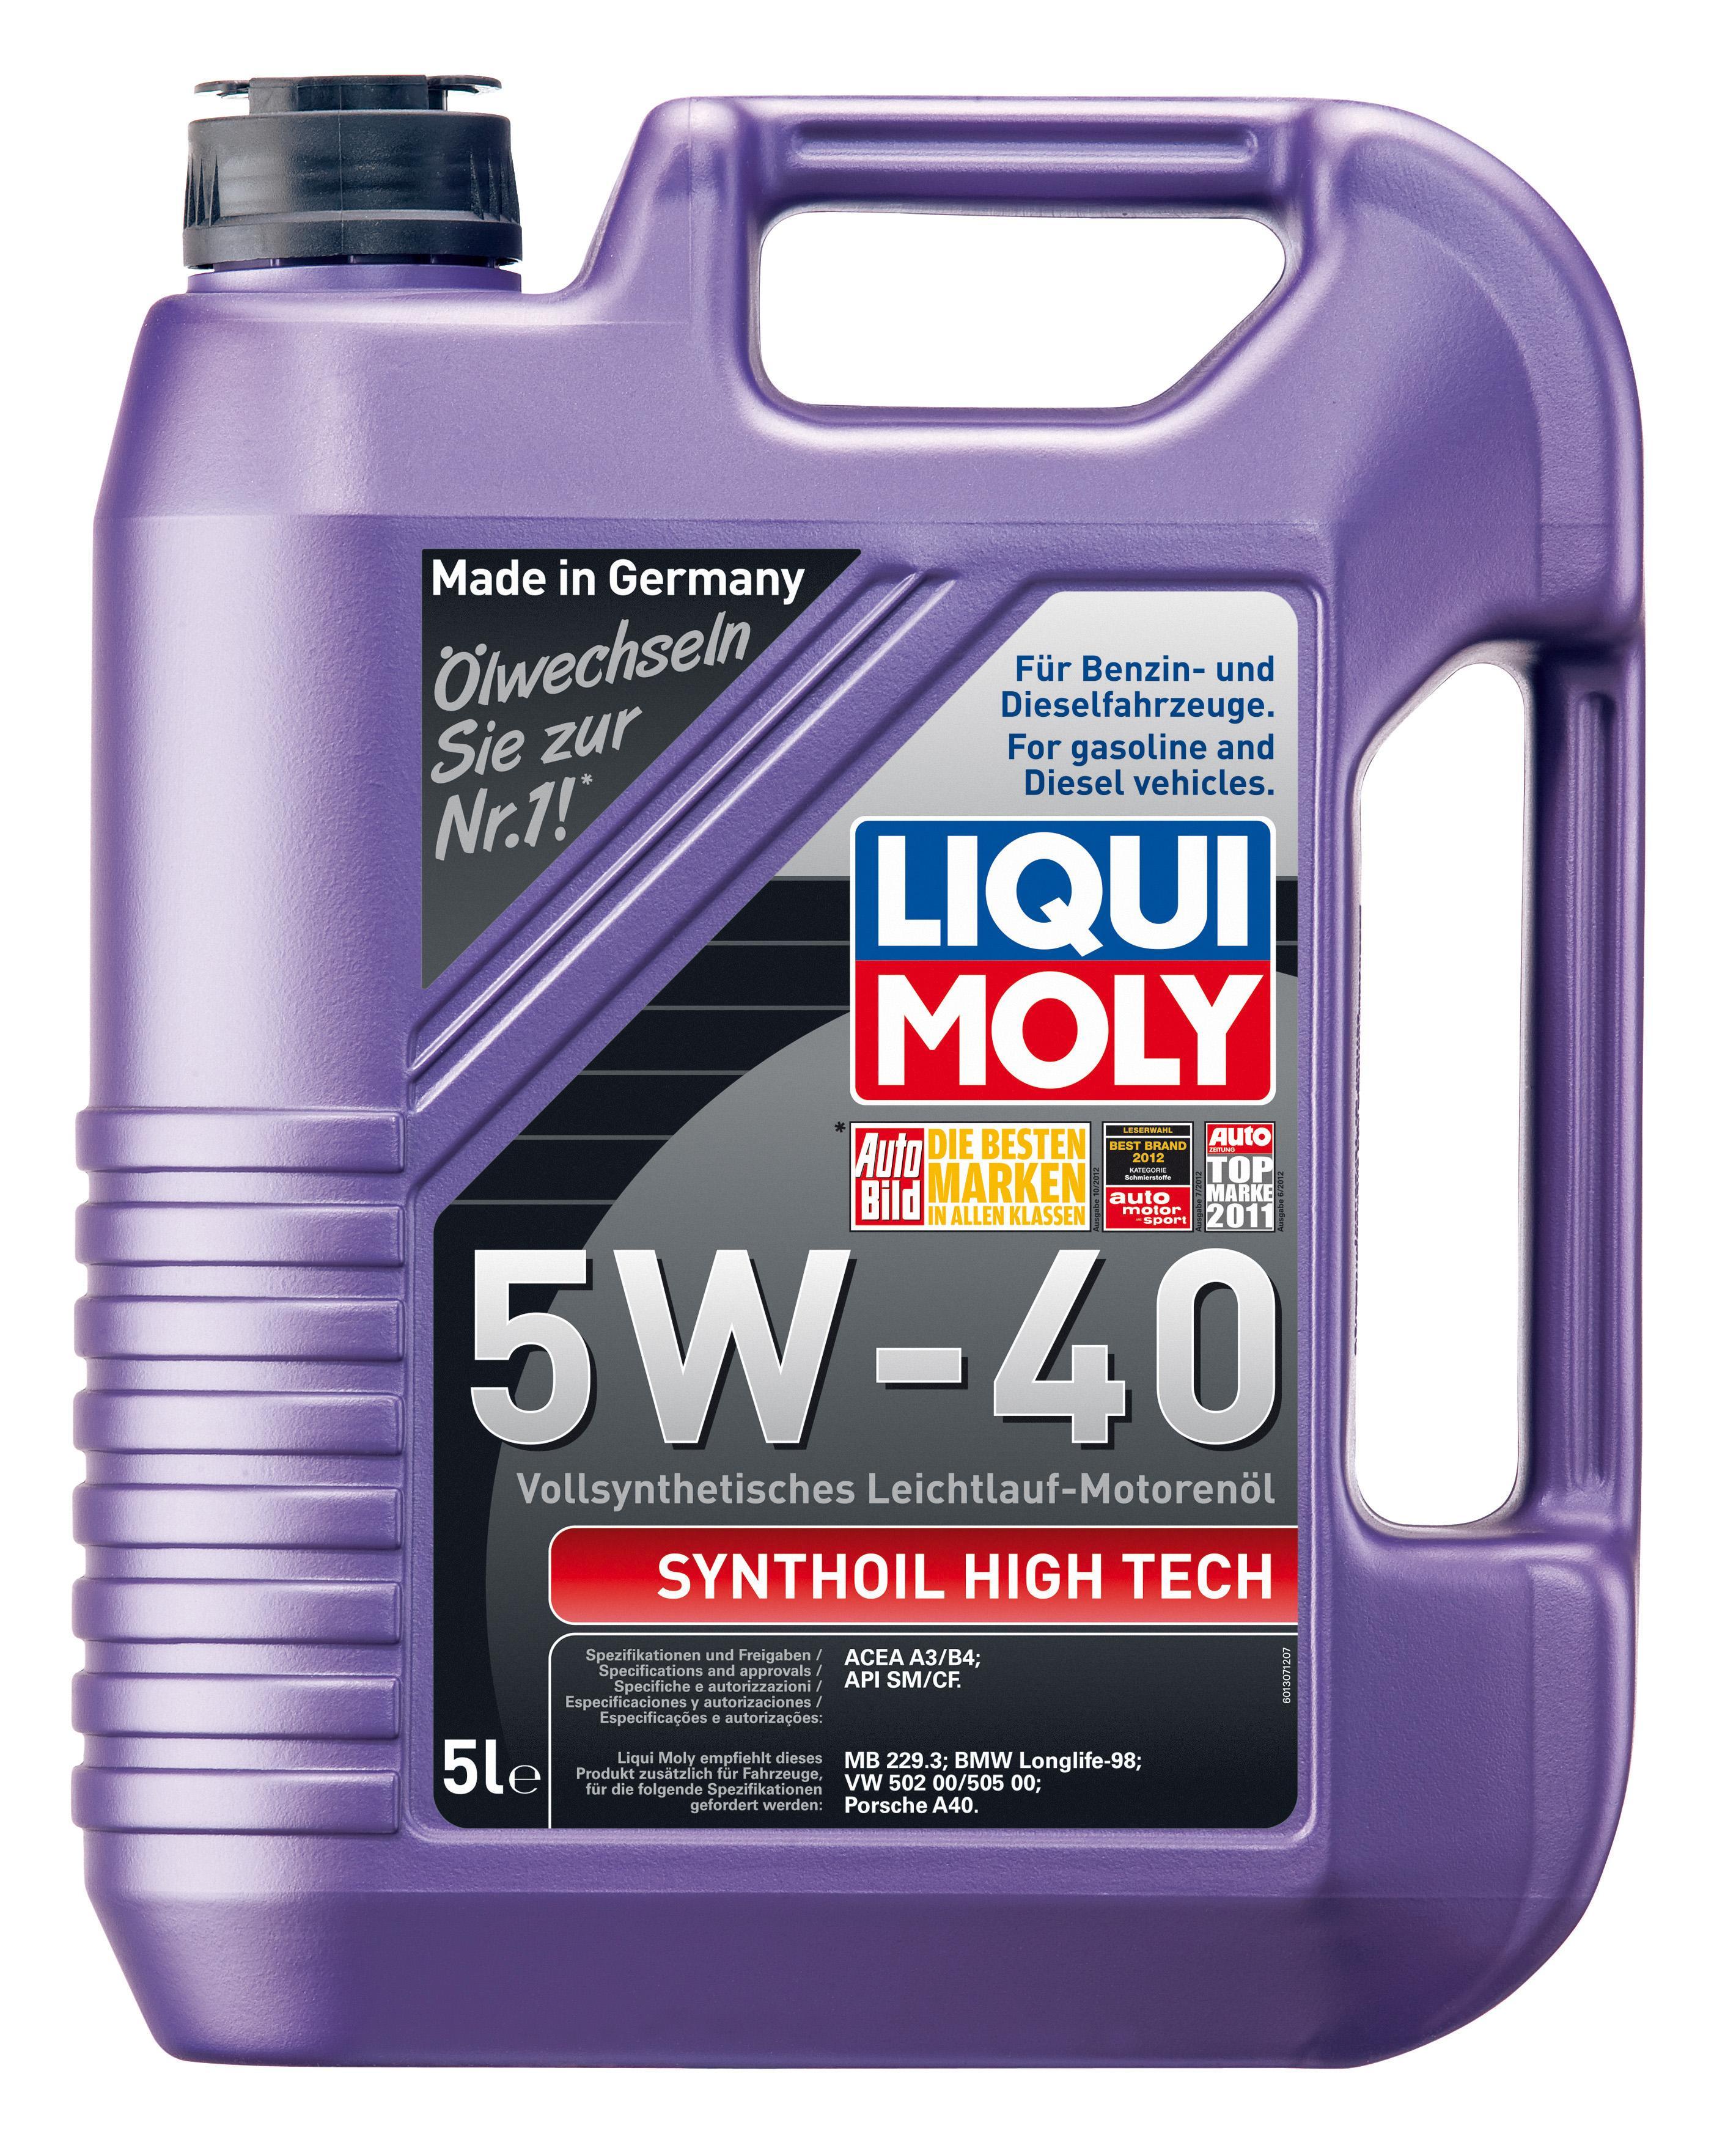 Изображение для Моторное масло Liqui Moly Synthoil High Tech SAE 5W-40 5l